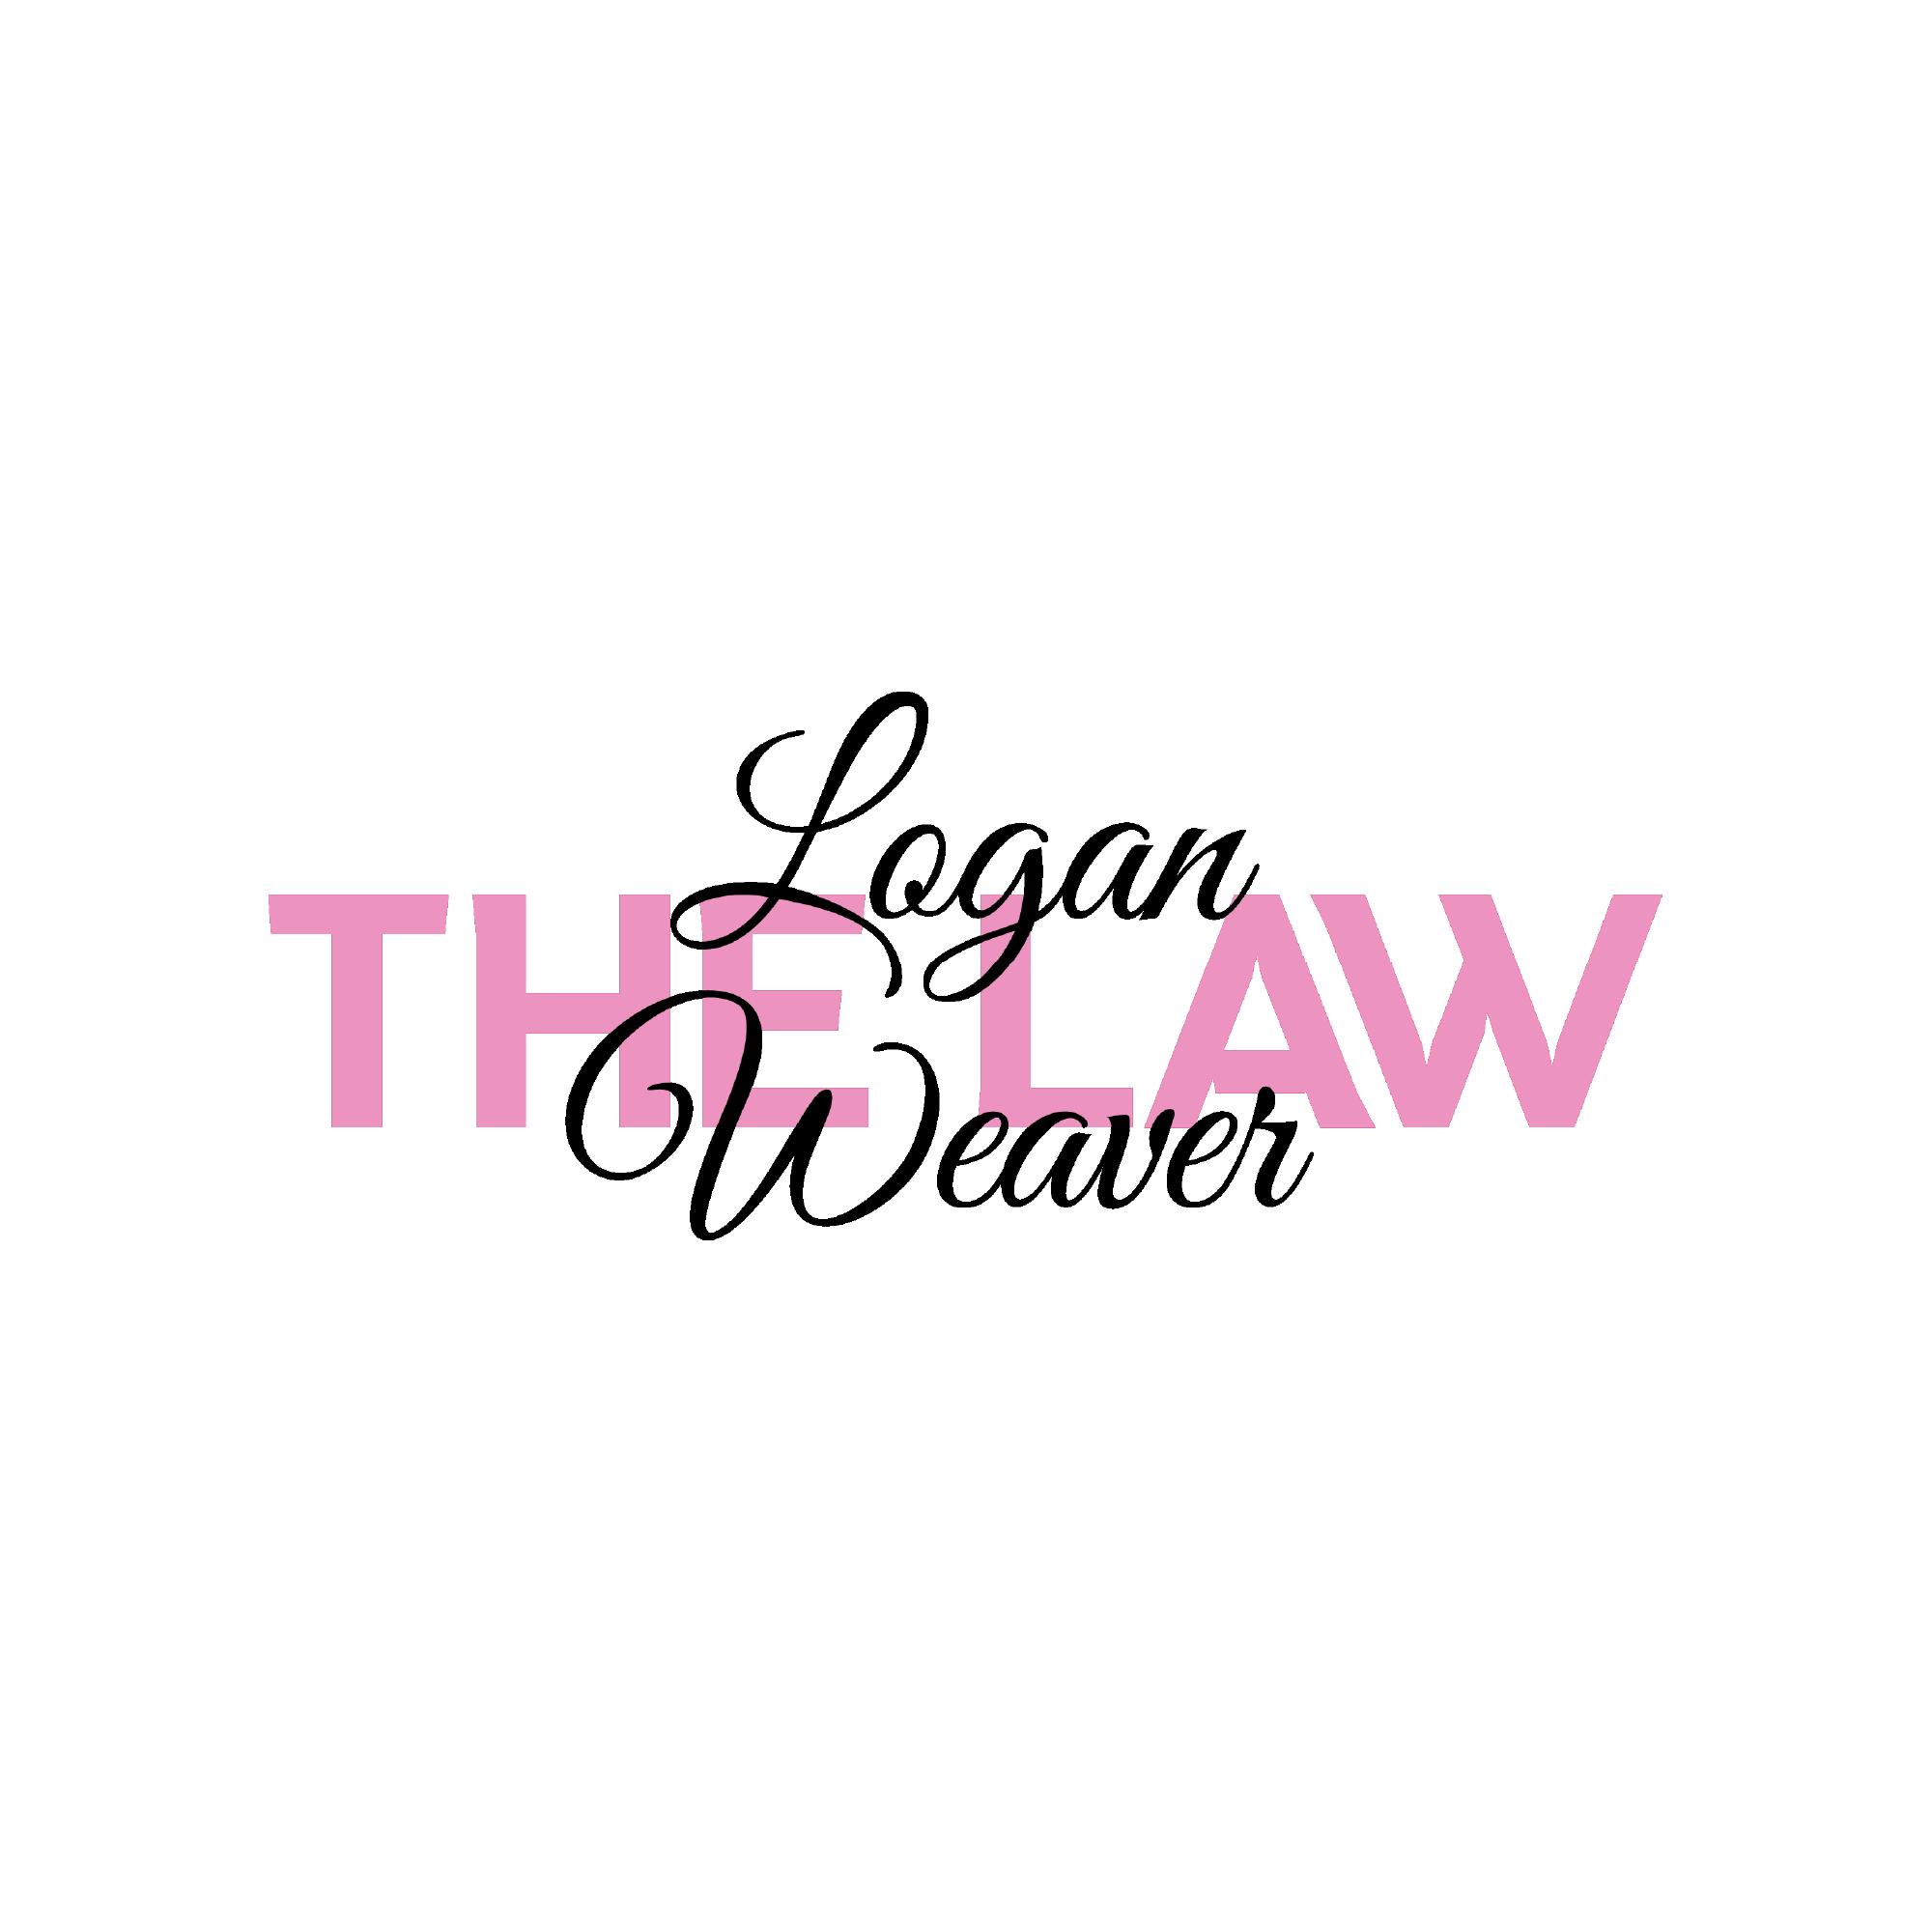 logan the law weaver logo